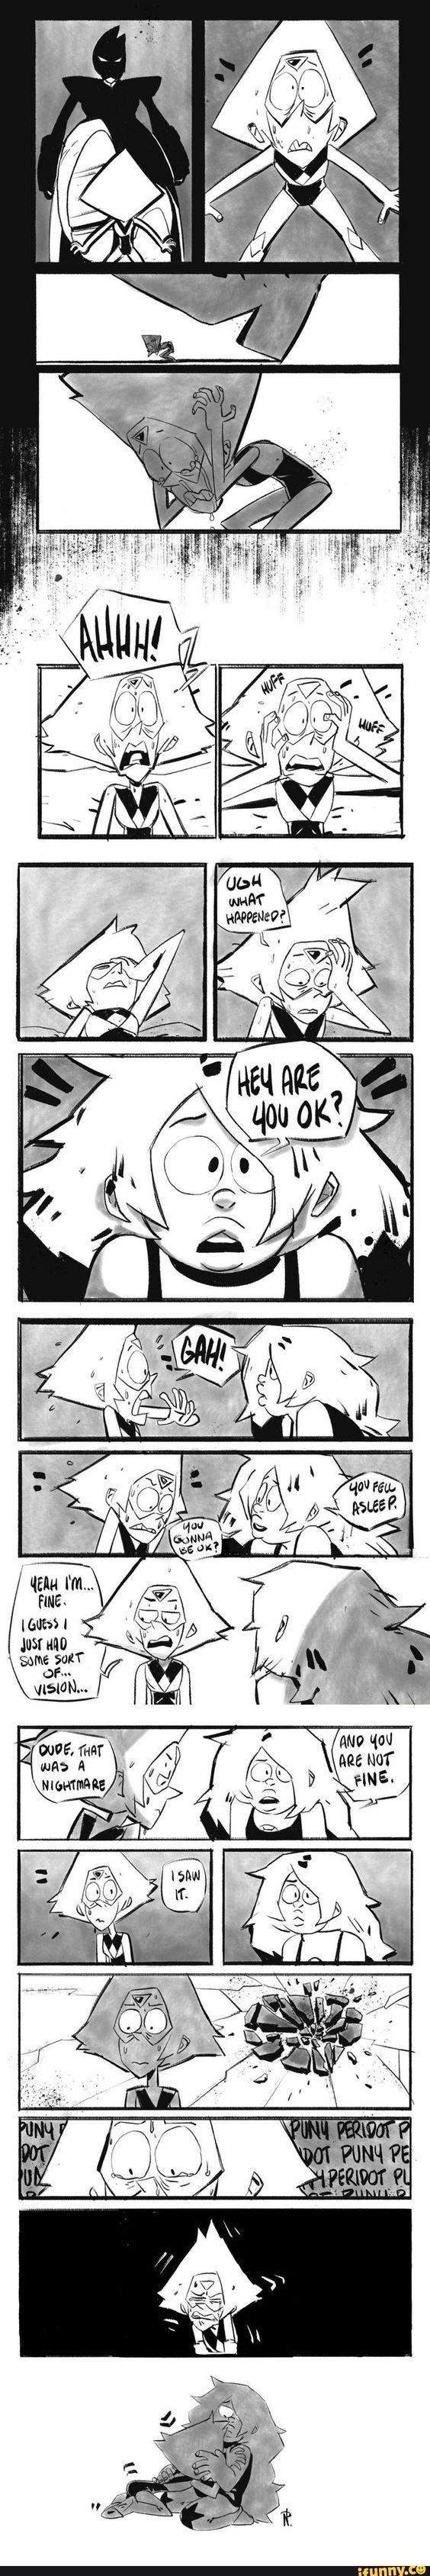 Steven Universe, Peridots Bad Dream